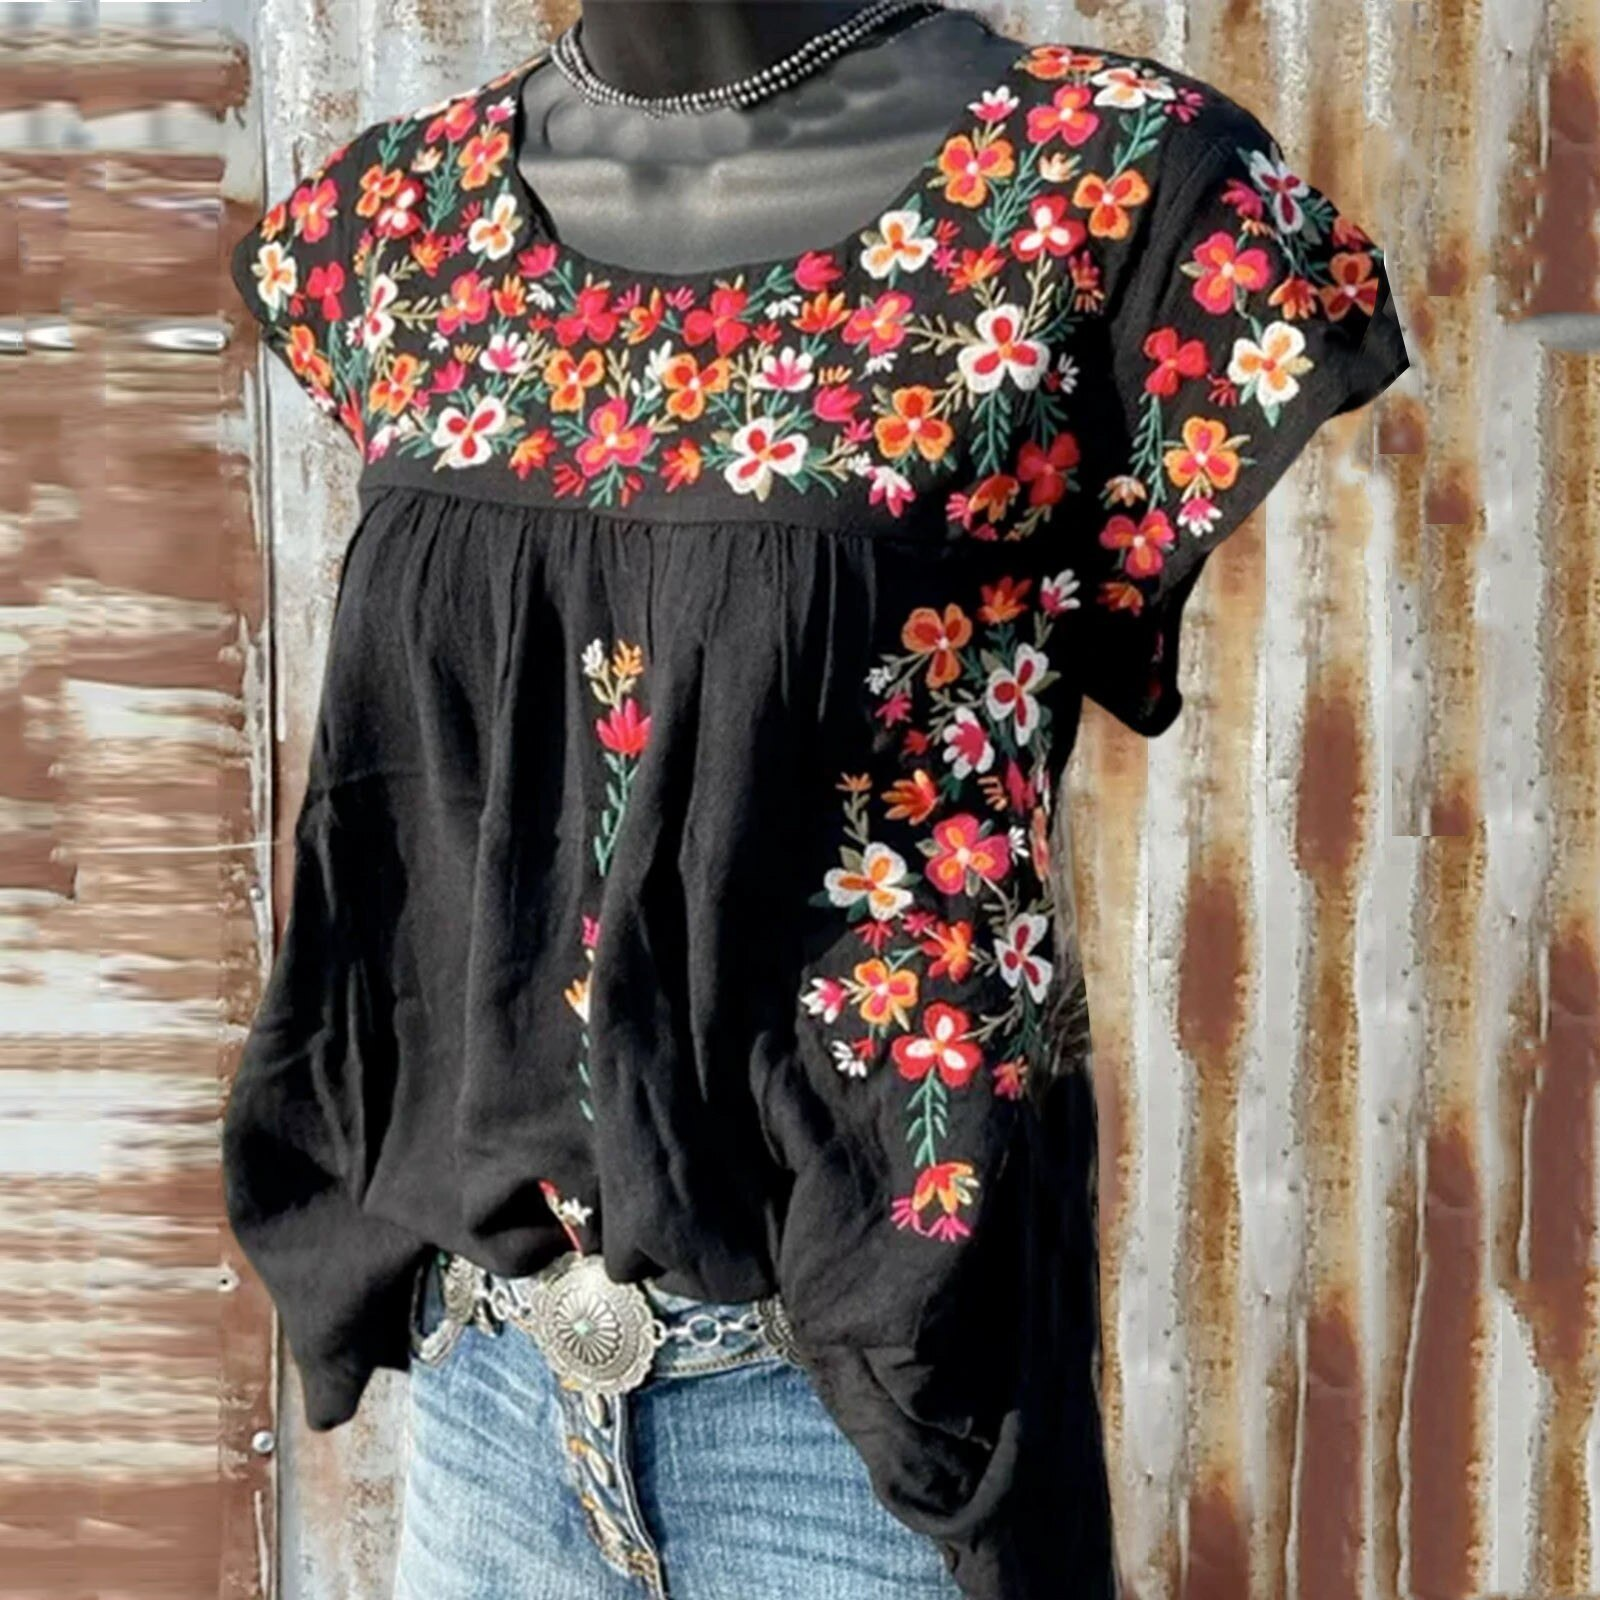 Blouses Women's Shirt Casual Floral Print Loose O-neck Short Sleeve Tanic Shirt Blouse Tops Women Clothing рубашка женская